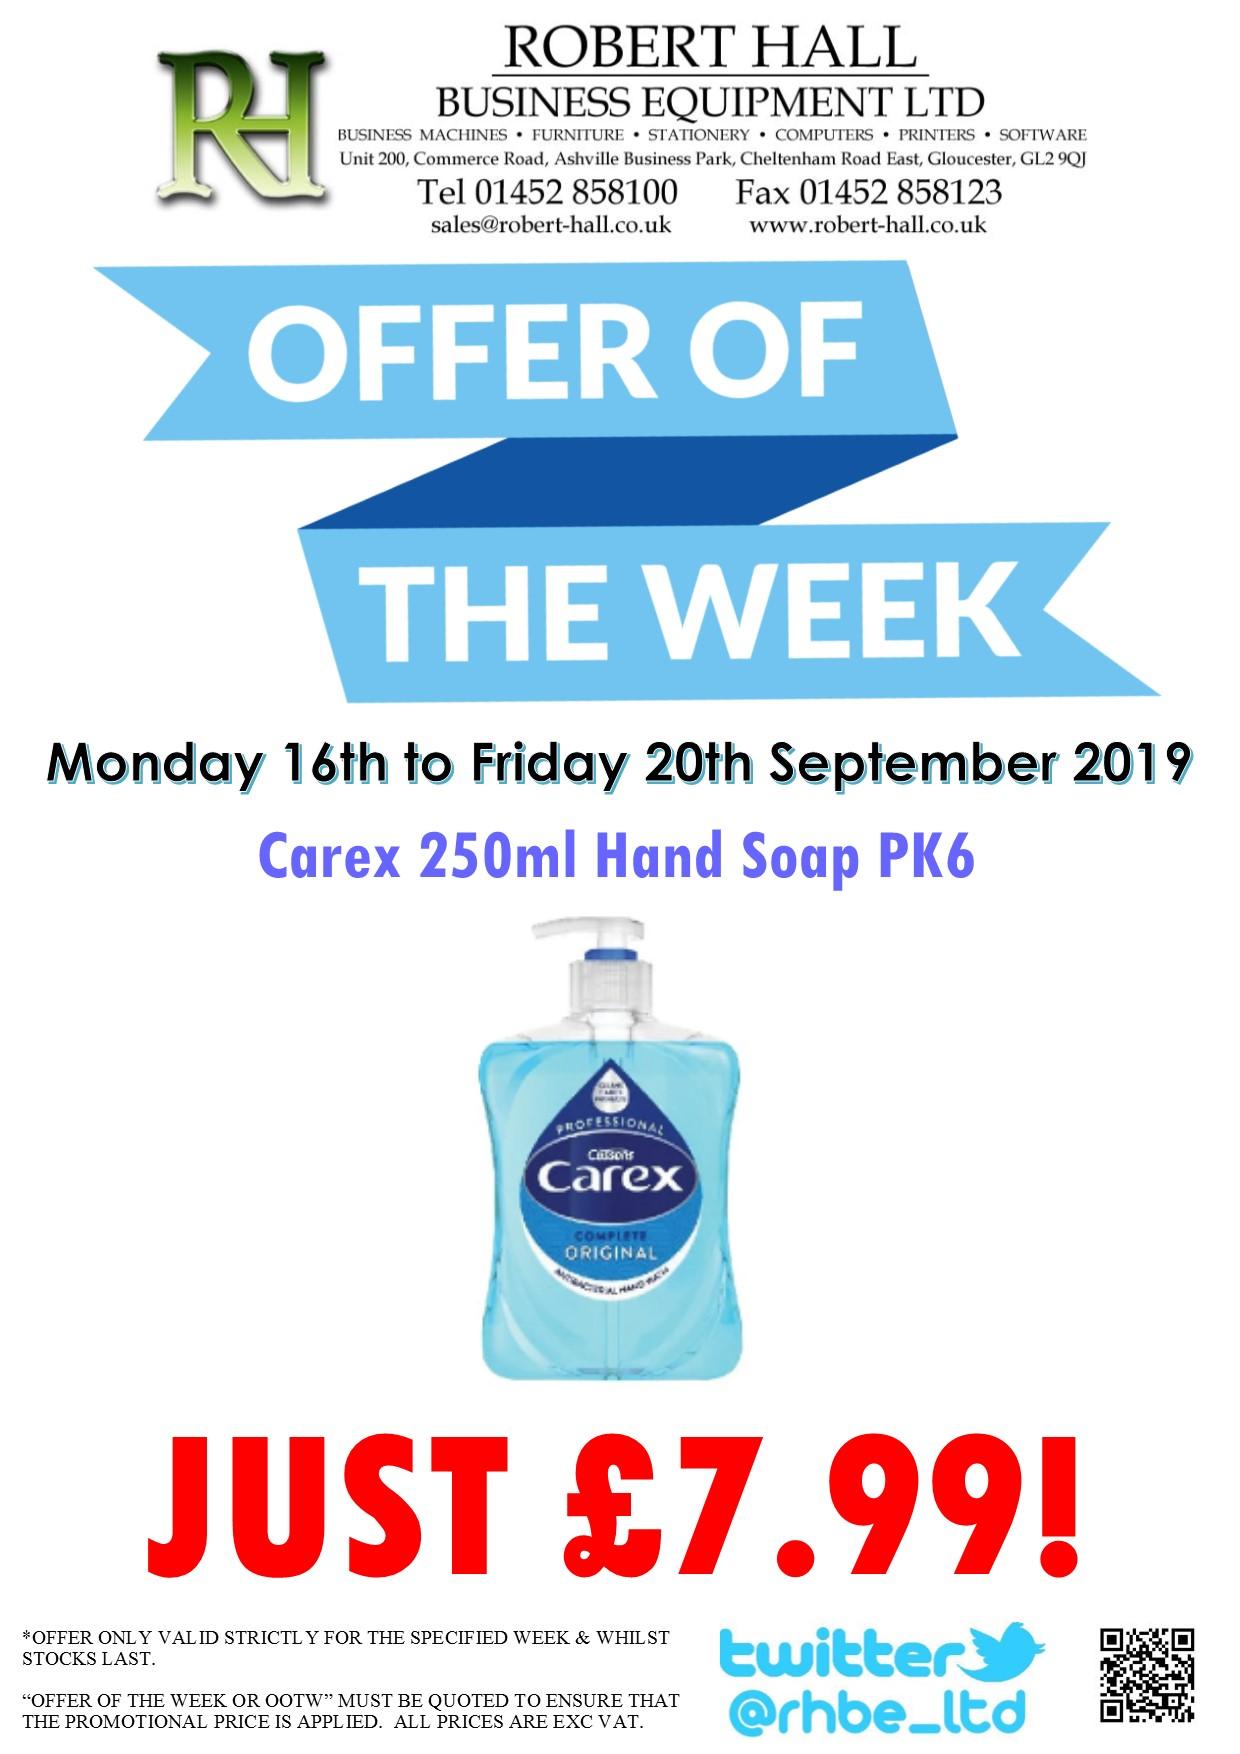 Offer Of The Week: Carex 250ml Original Hand Soap PK6